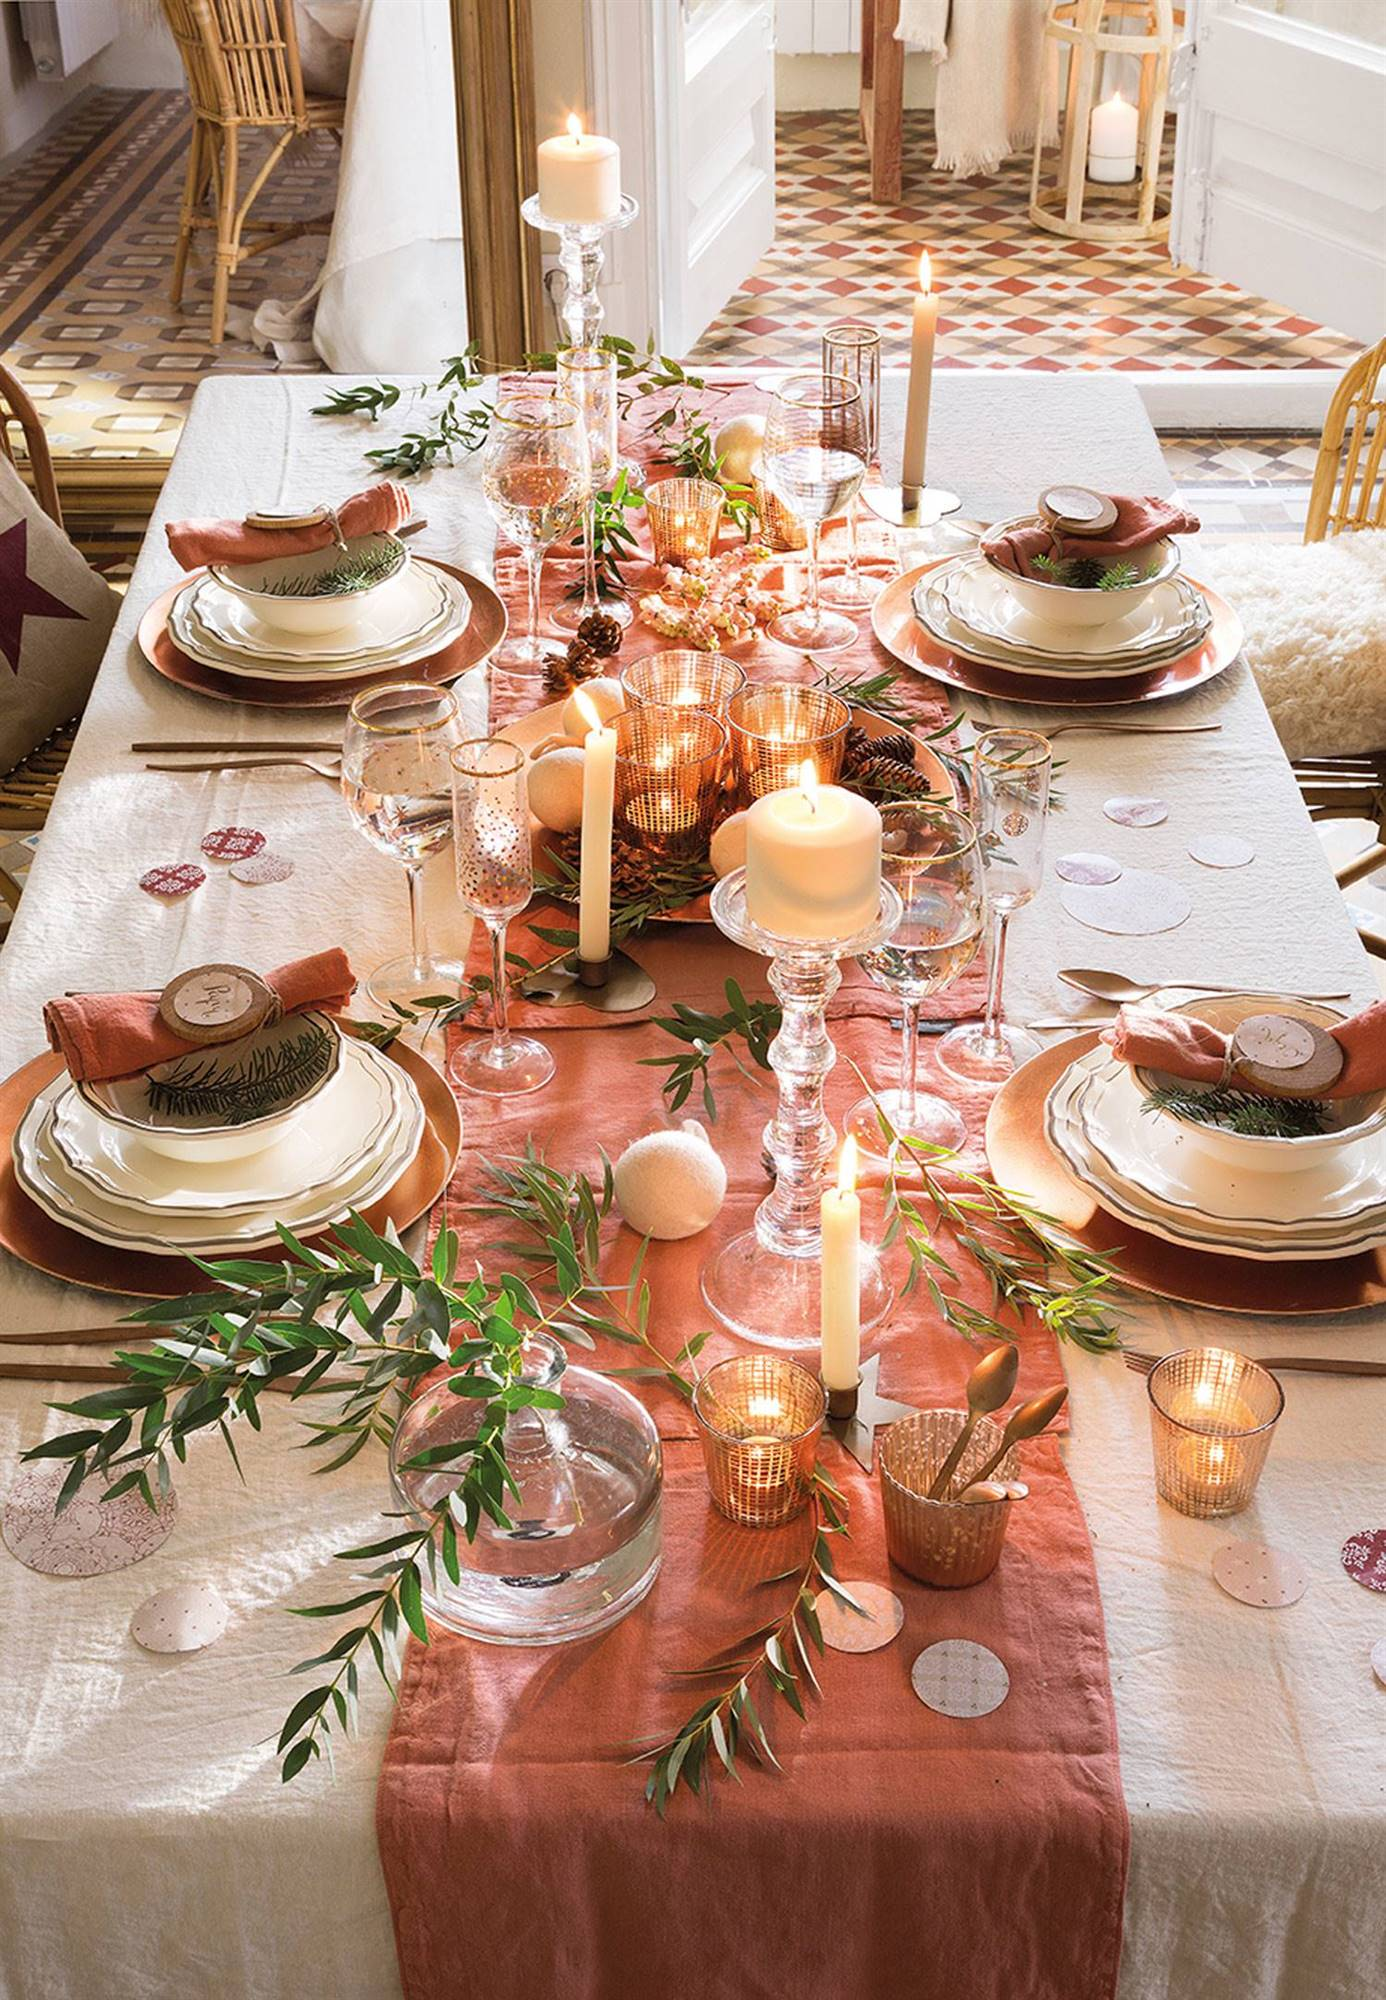 00444854 cadbb956 1386x2000 1 - Decora tu mesa de Navidad